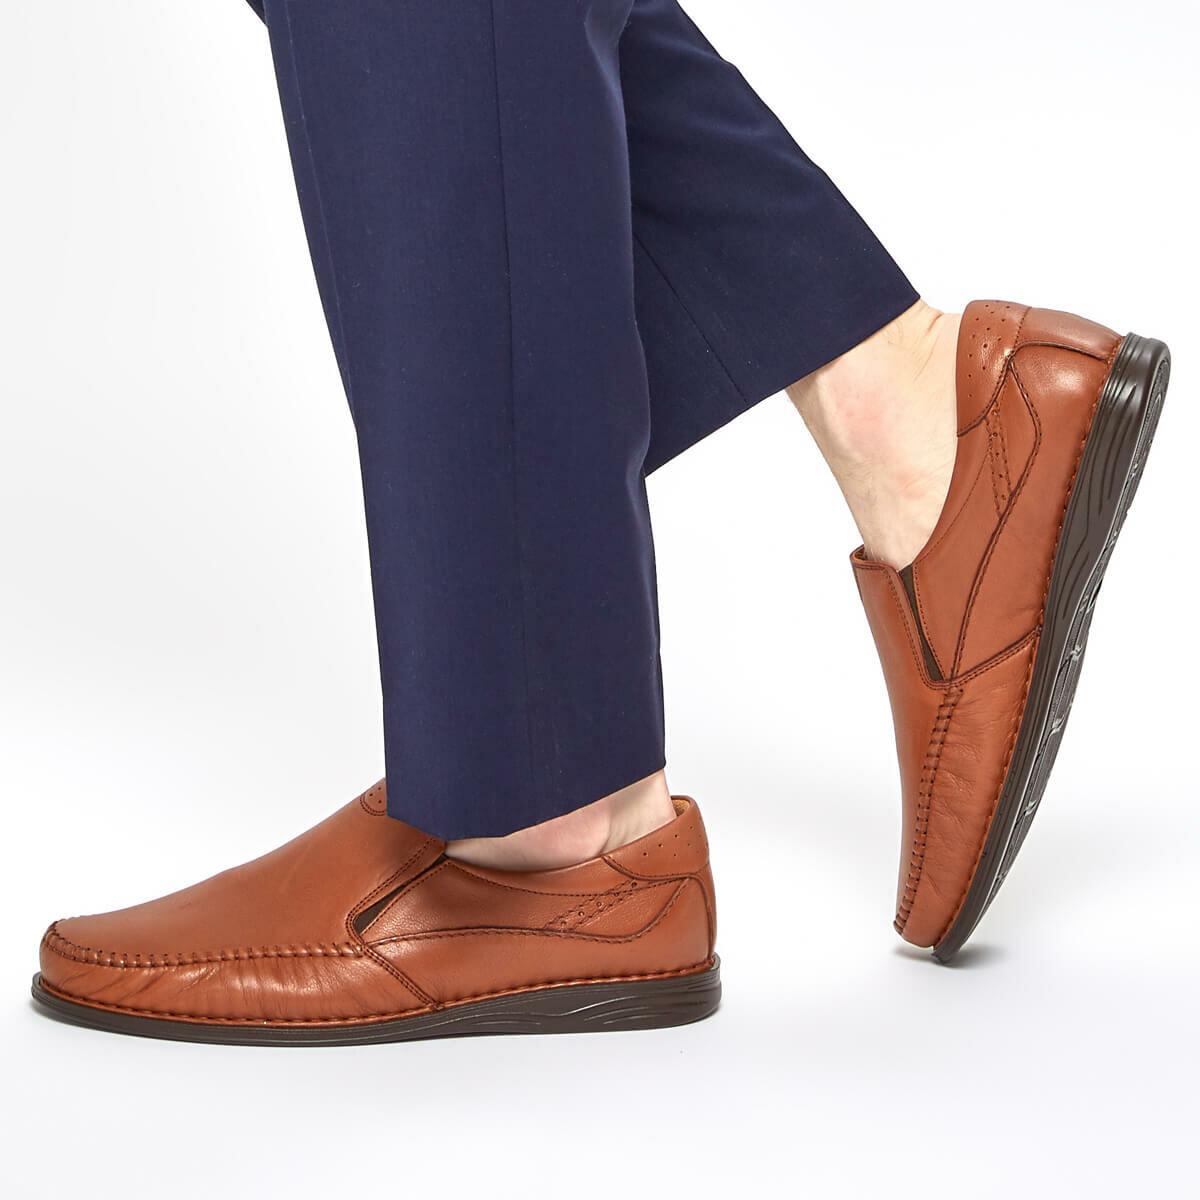 FLO 91 105517.M zapatos clásicos para hombre color marrón Polaris 5 puntos